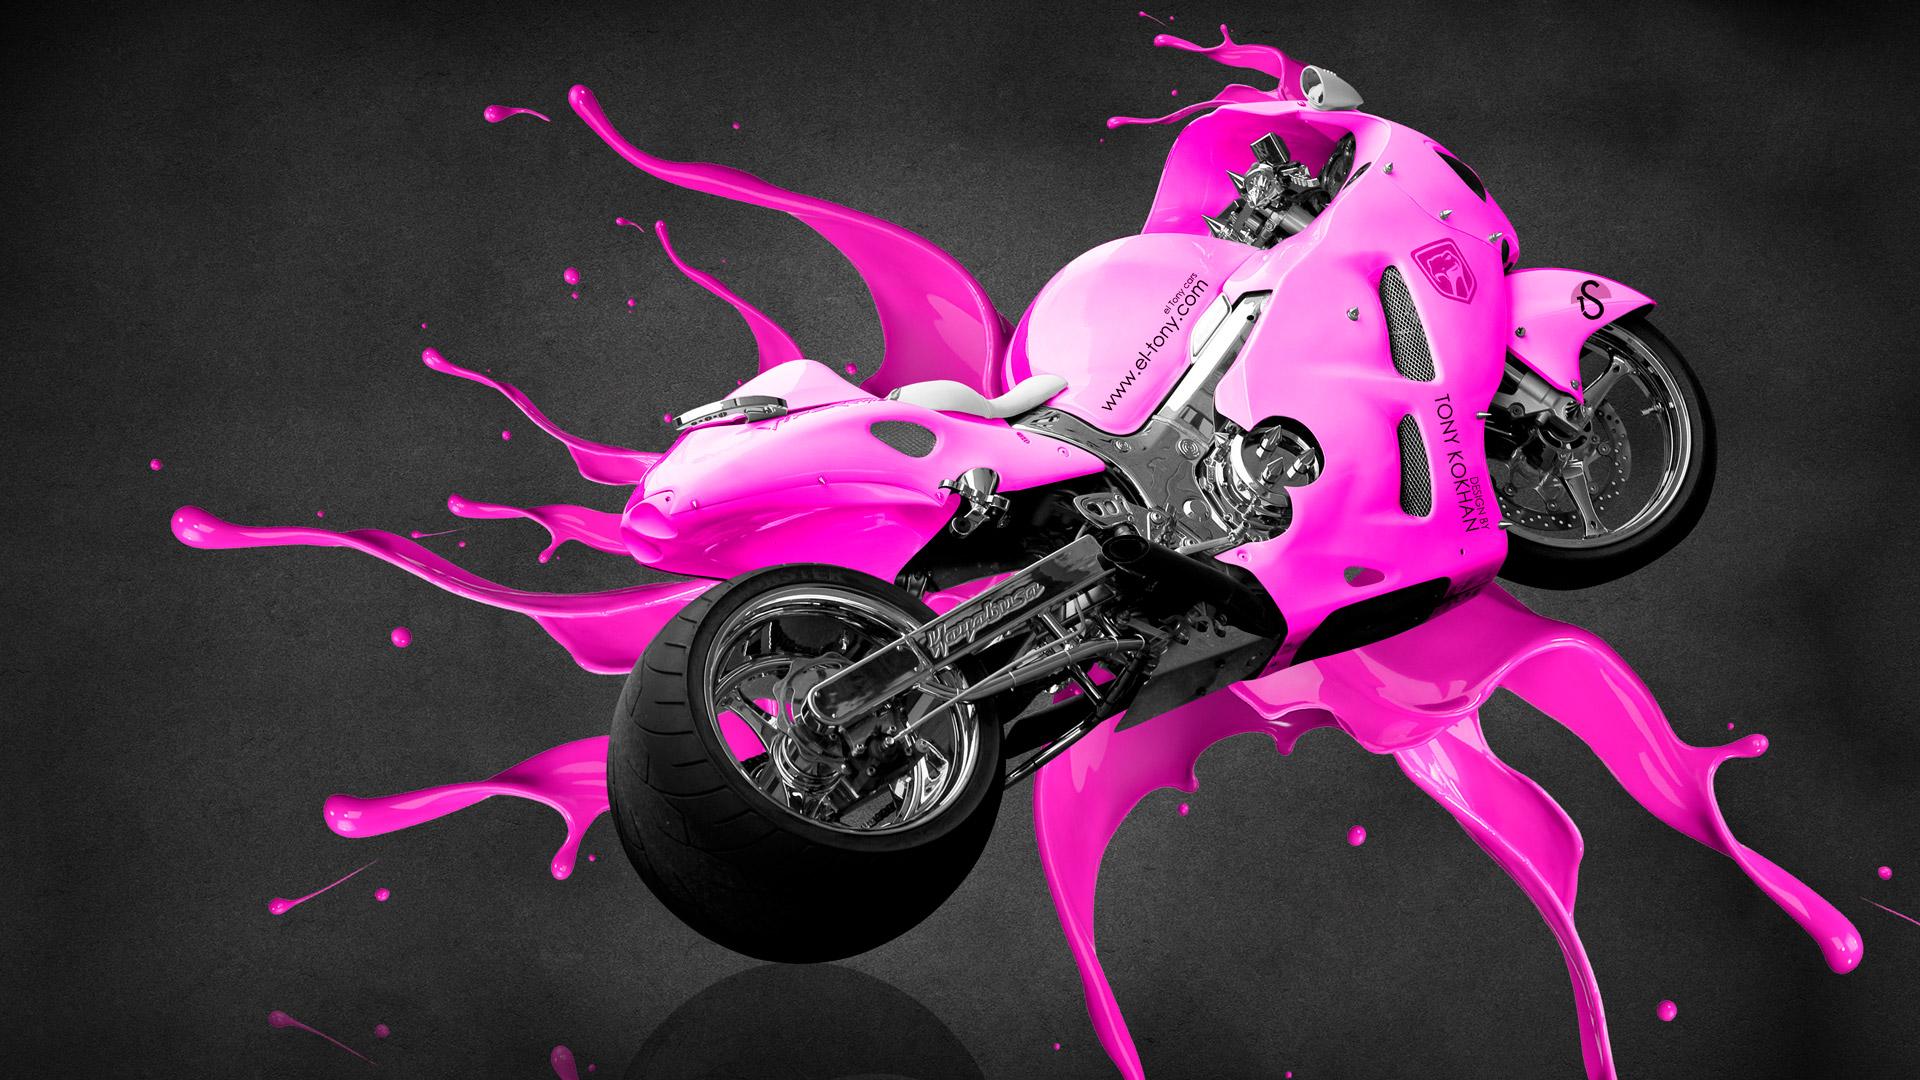 Moto suzuki hayabusa pink live colors bike 2014 hd wallpapers design moto suzuki hayabusa pink live colors bike 2014 hd wallpapers design by tony kokhan el tonyg 19201080 suzuki hayabusa live colors bike 2014 altavistaventures Gallery